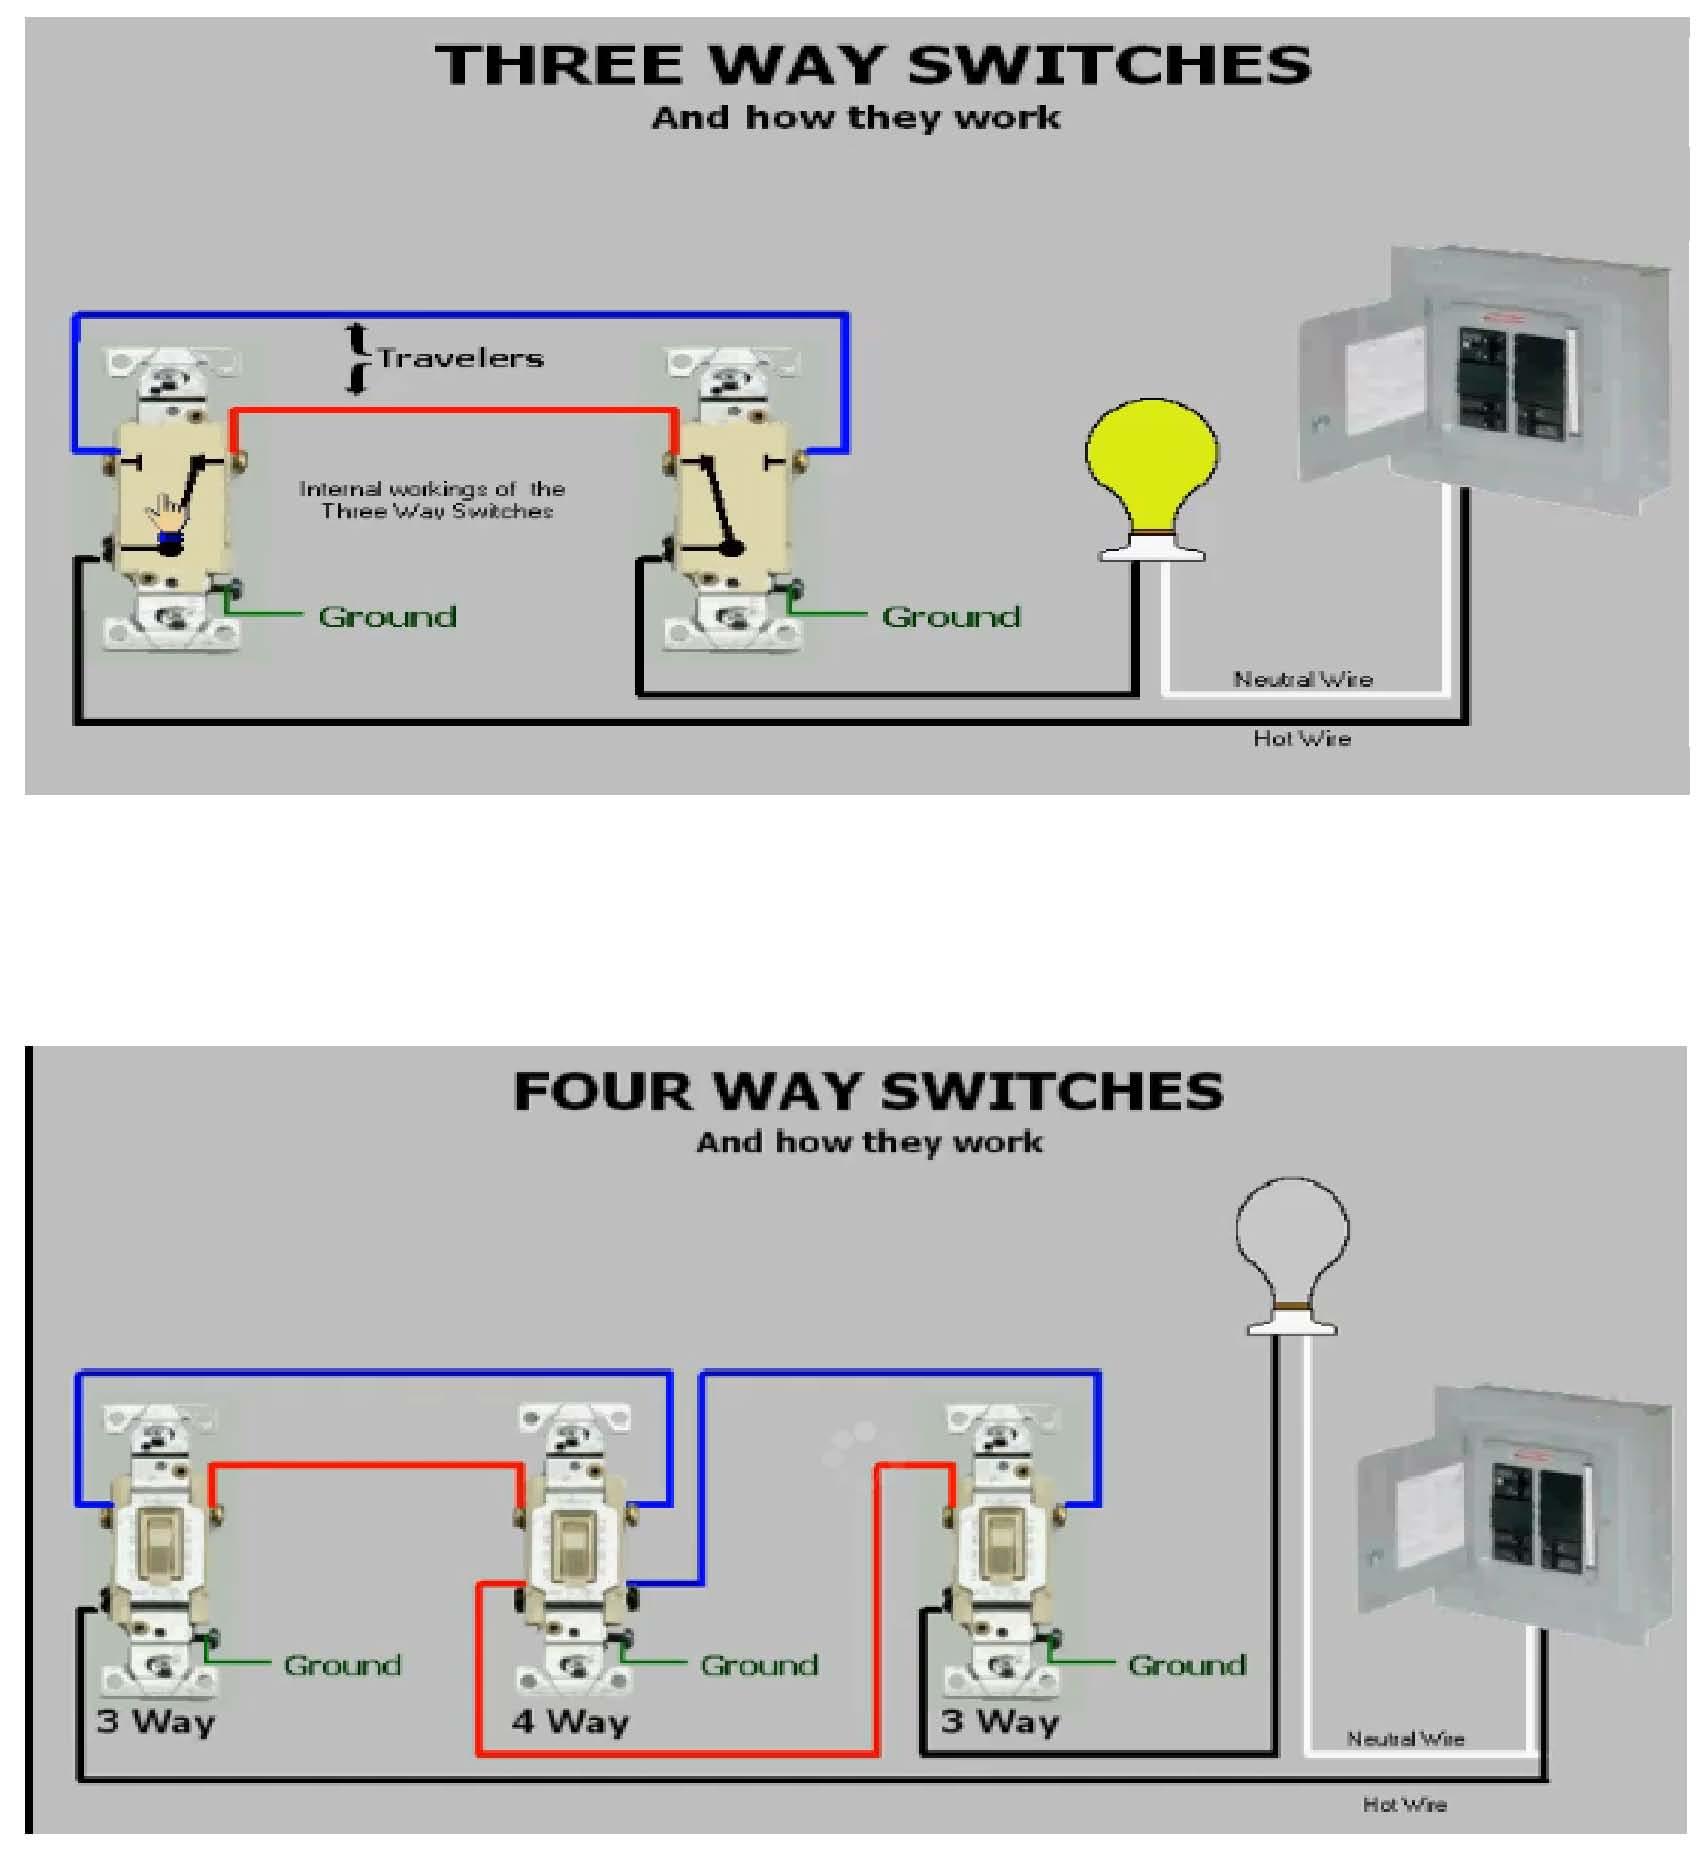 4 Way Switch Uses